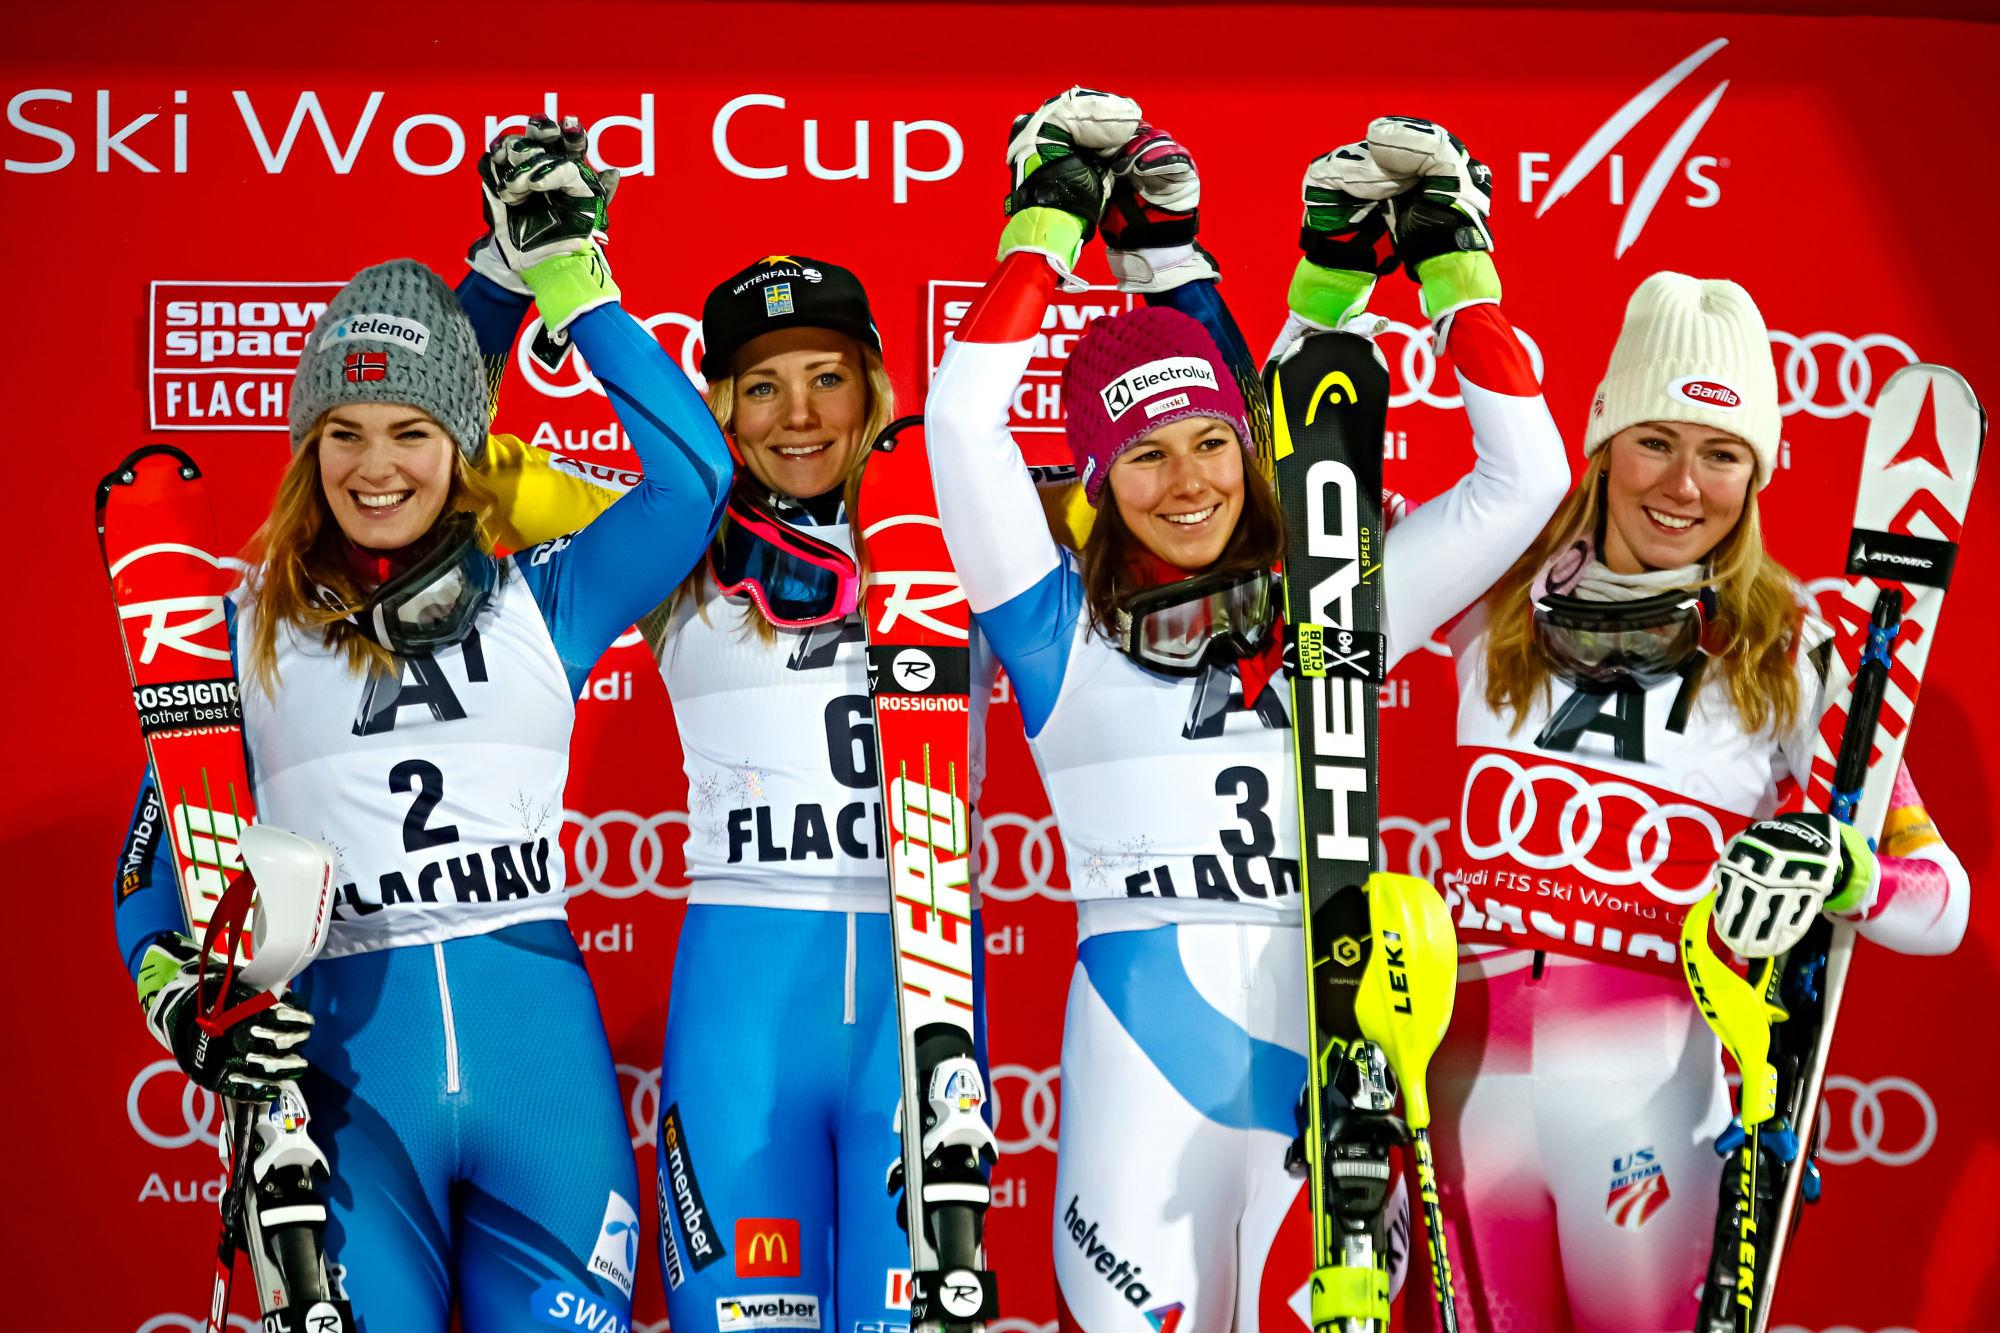 Da sinistra: Nina Loeseth, Frida Hansdotter, Wendy Holdener e Mikaela Shiffrin sul podio a Flachau (@Zoom agence)